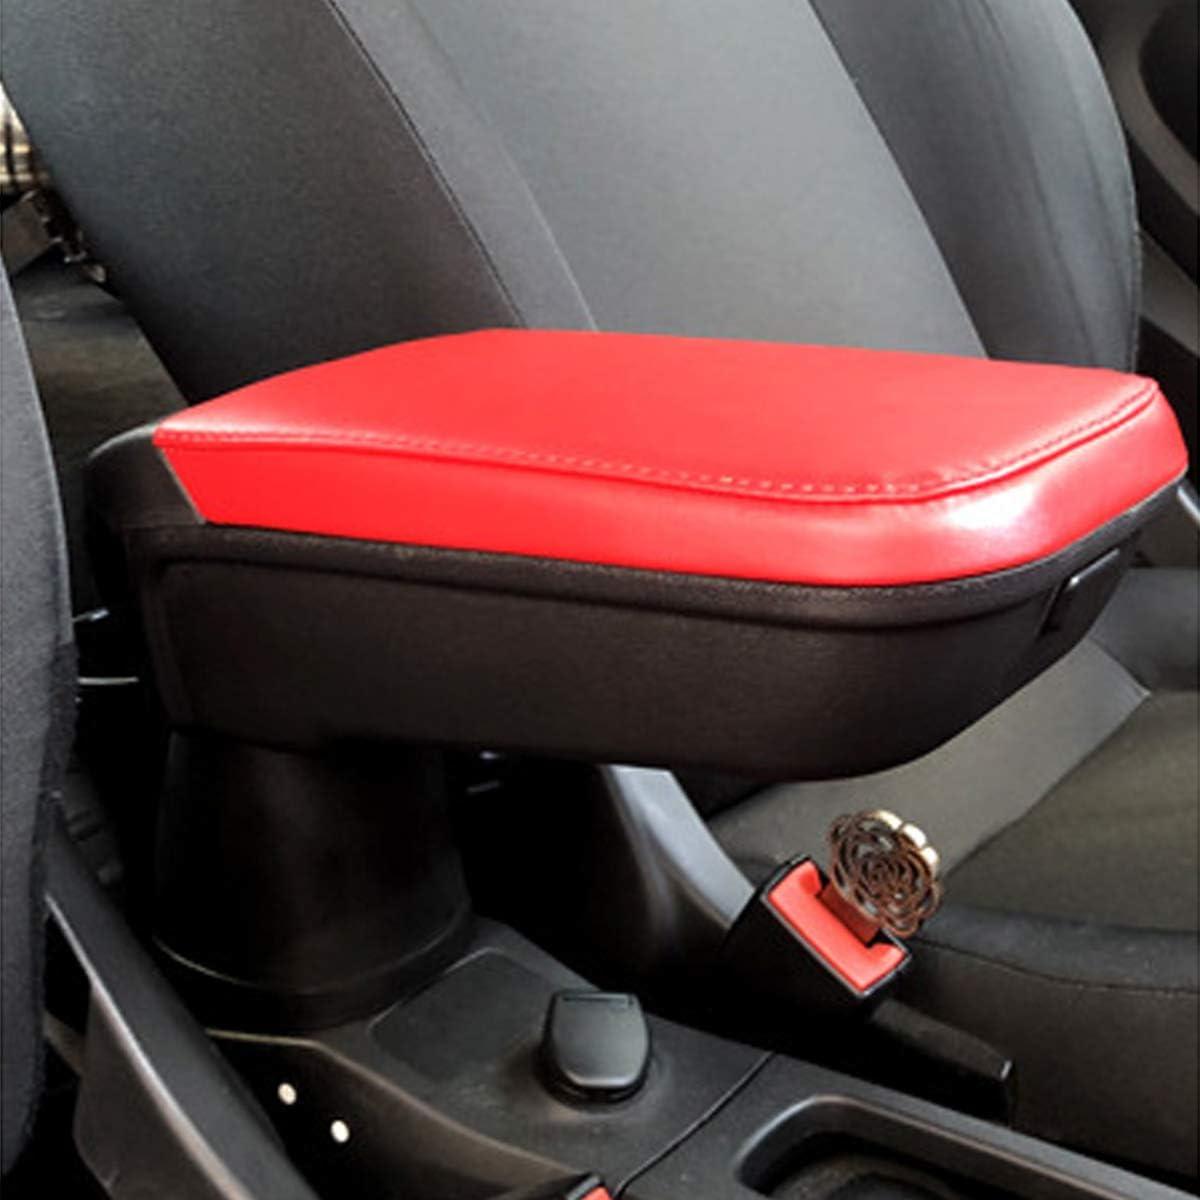 contenedor para consola central de coche Recambio con soporte para taza caja de almacenamiento para Smart 453 Fortwo Forfour 2015-2018